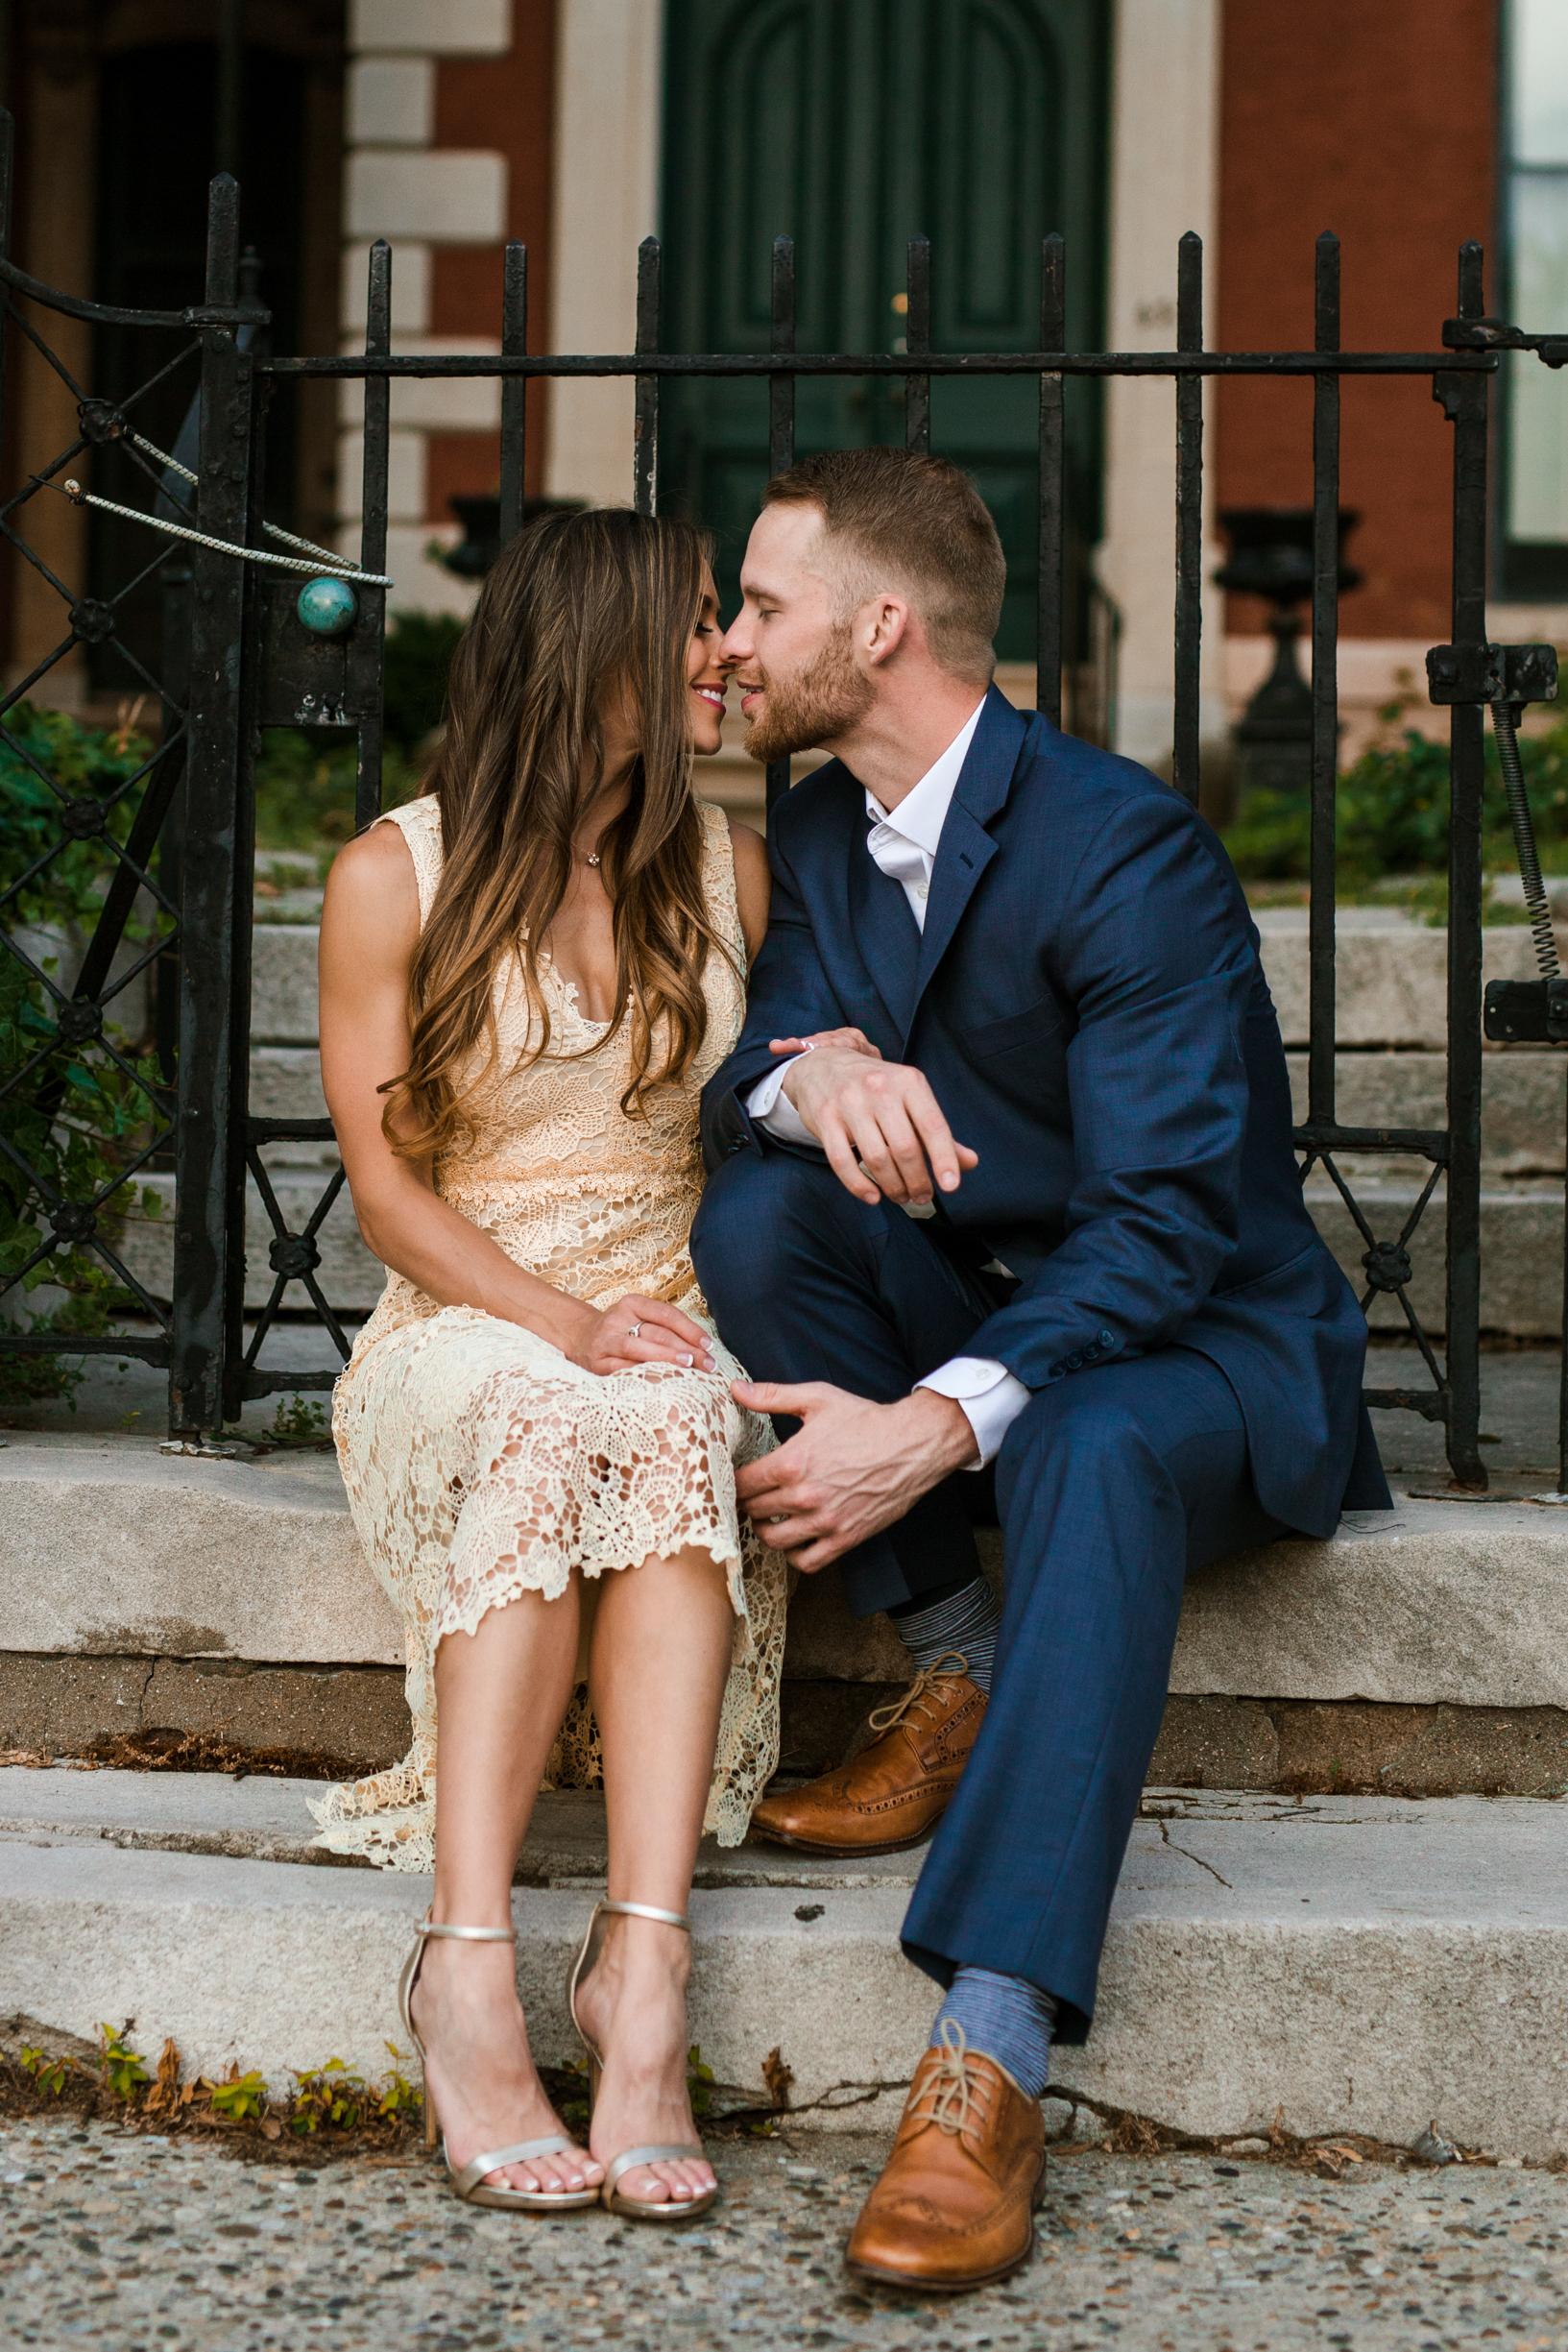 Victoria & Chad Engagement 2018 Crystal Ludwick Photo Louisville Kentucky Wedding Photographer WEBSITE (28 of 48).jpg